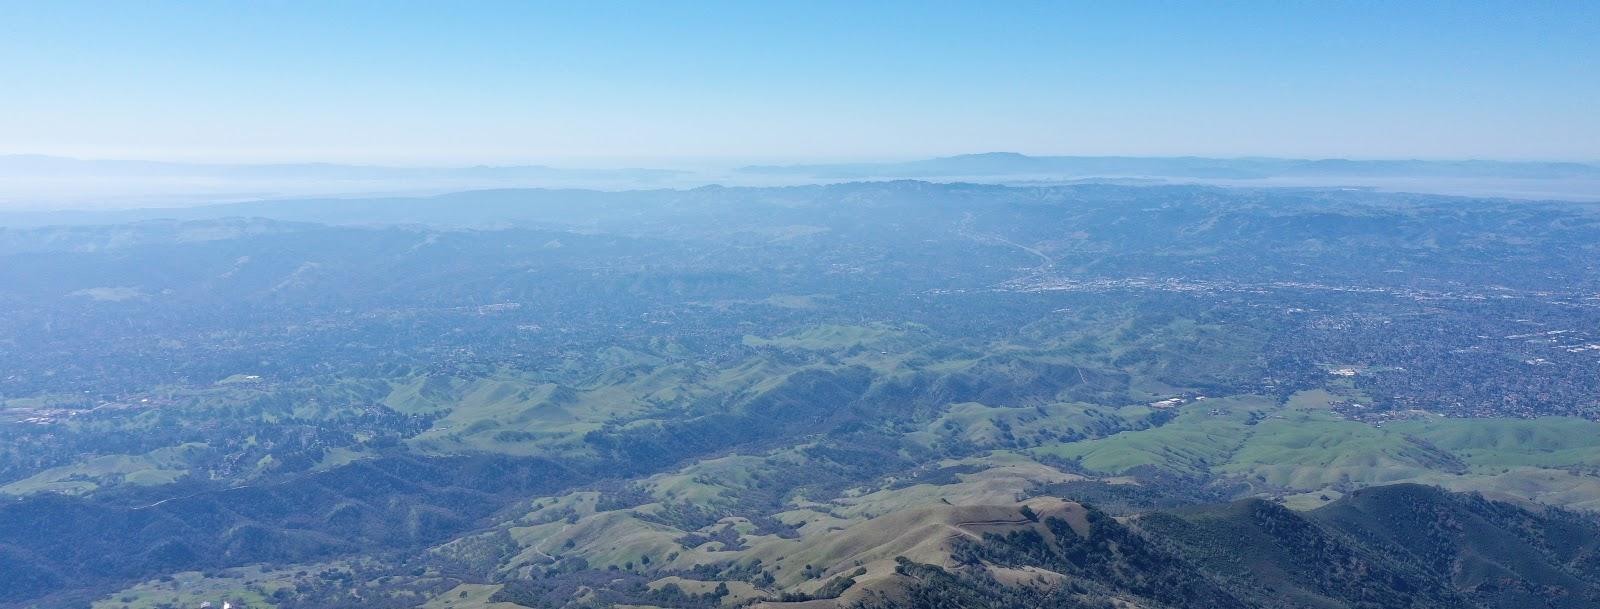 Bicycle ride up Mt. Diablo - Summit Road - Golden Gate Bridge and Mount Tamalpais